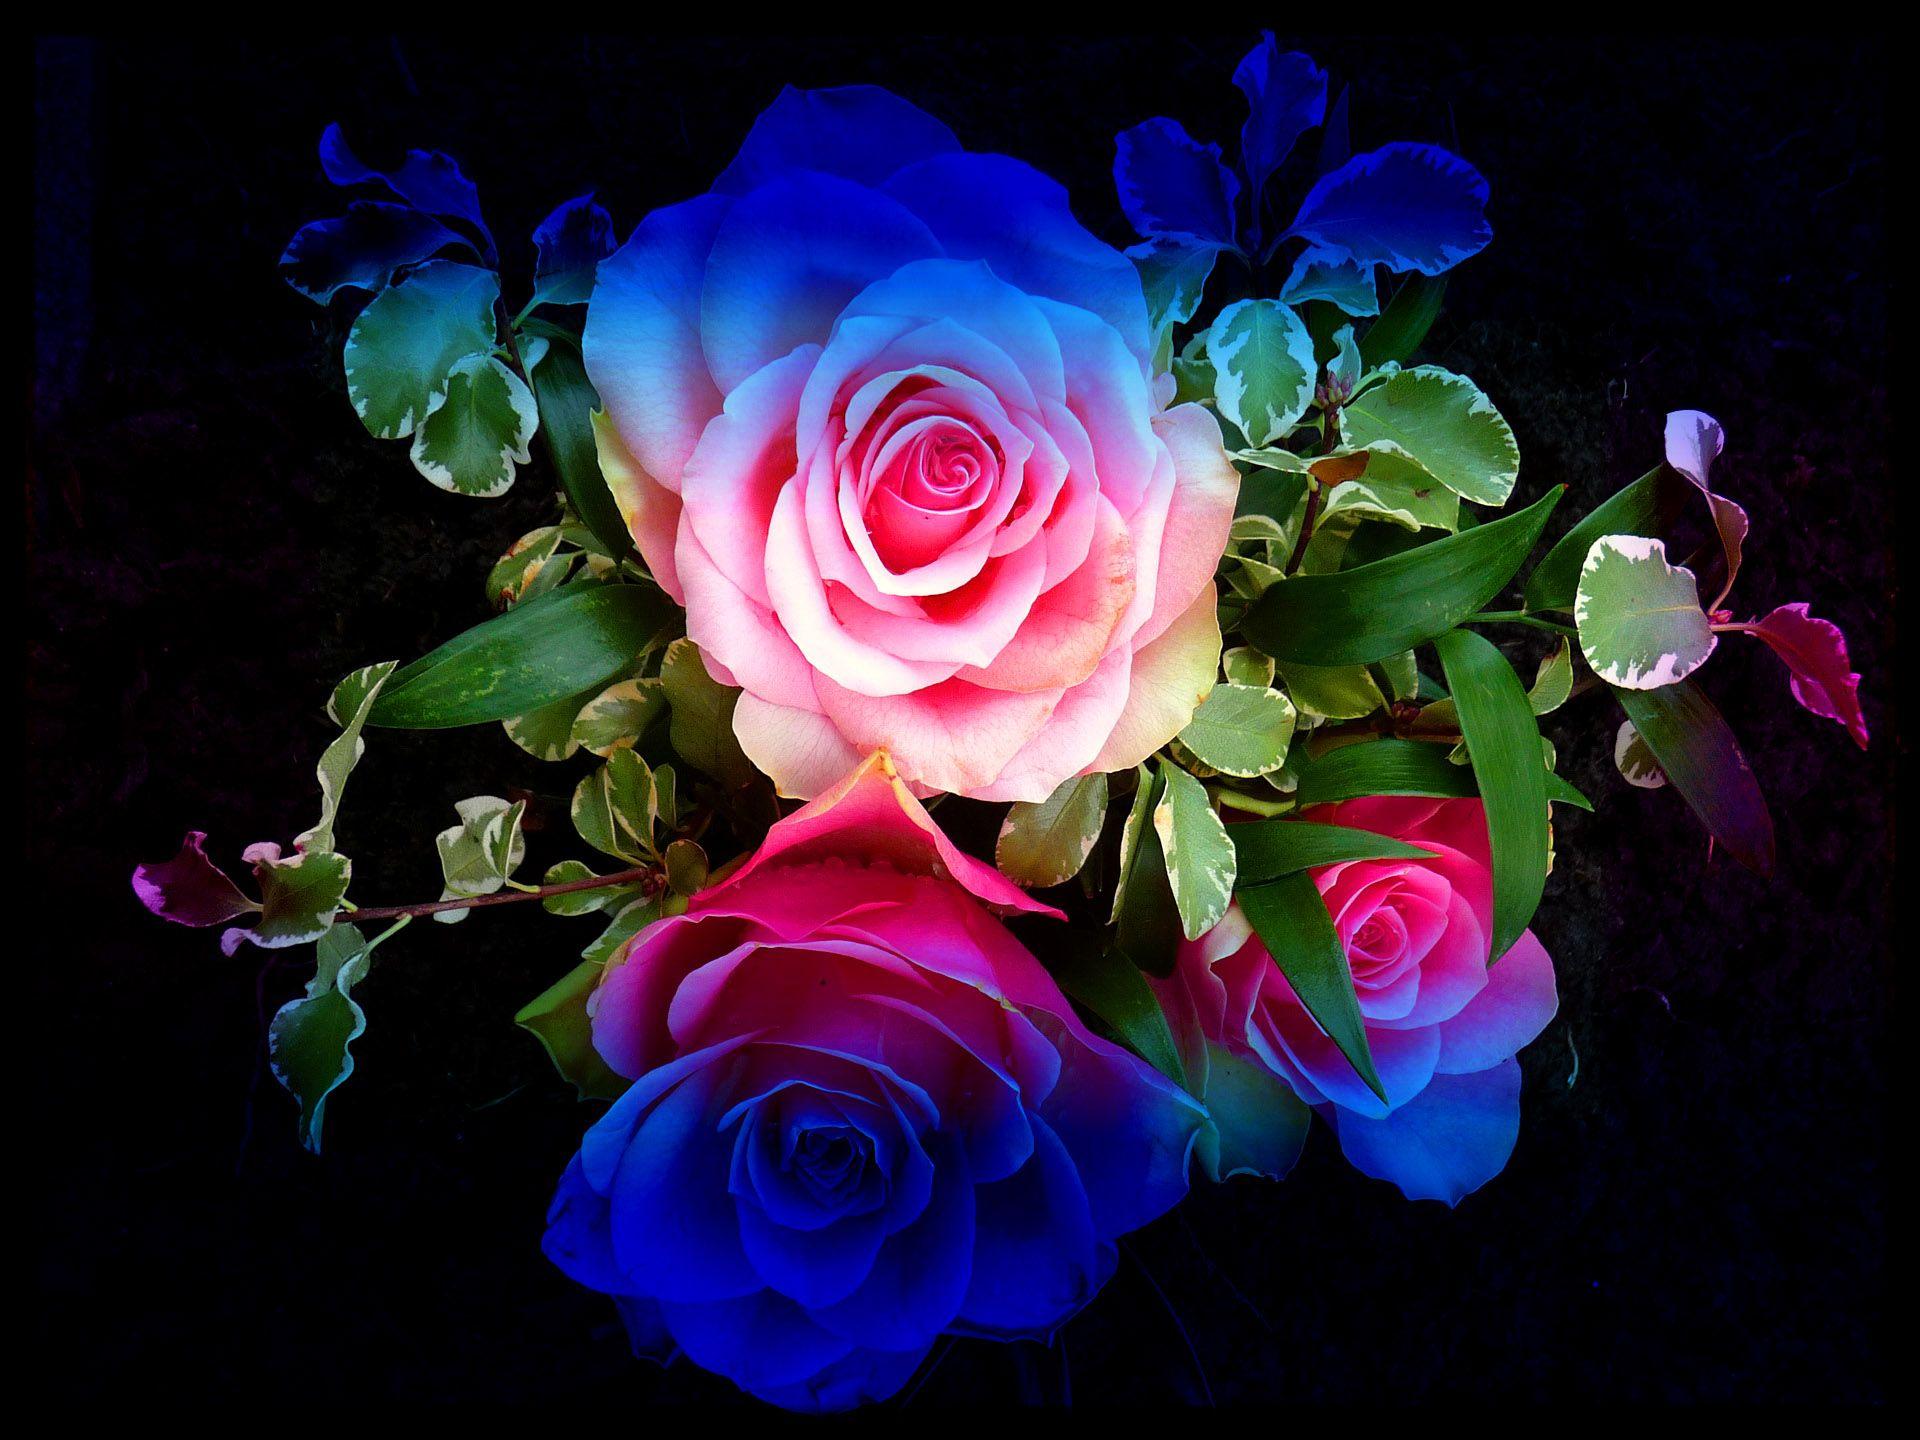 glitter roses backgrounds Wallpaper Colourful Roses